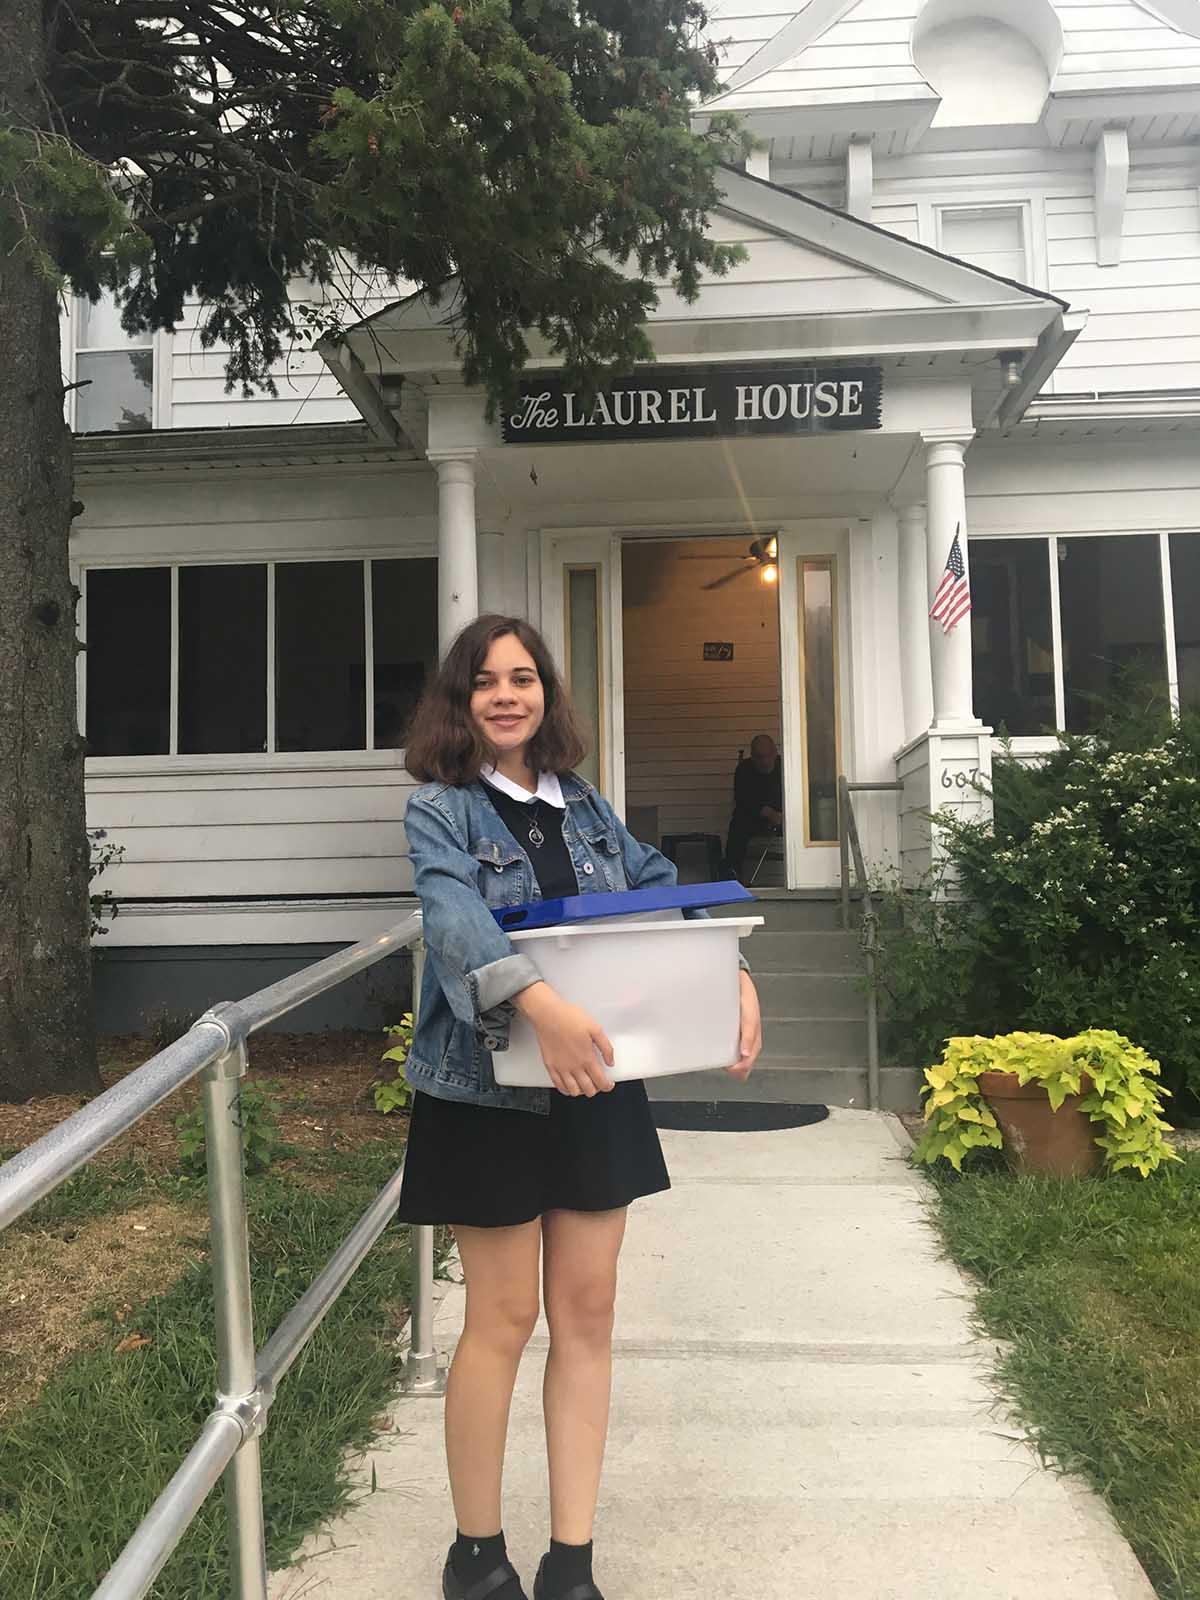 A volunteer at Laurel House